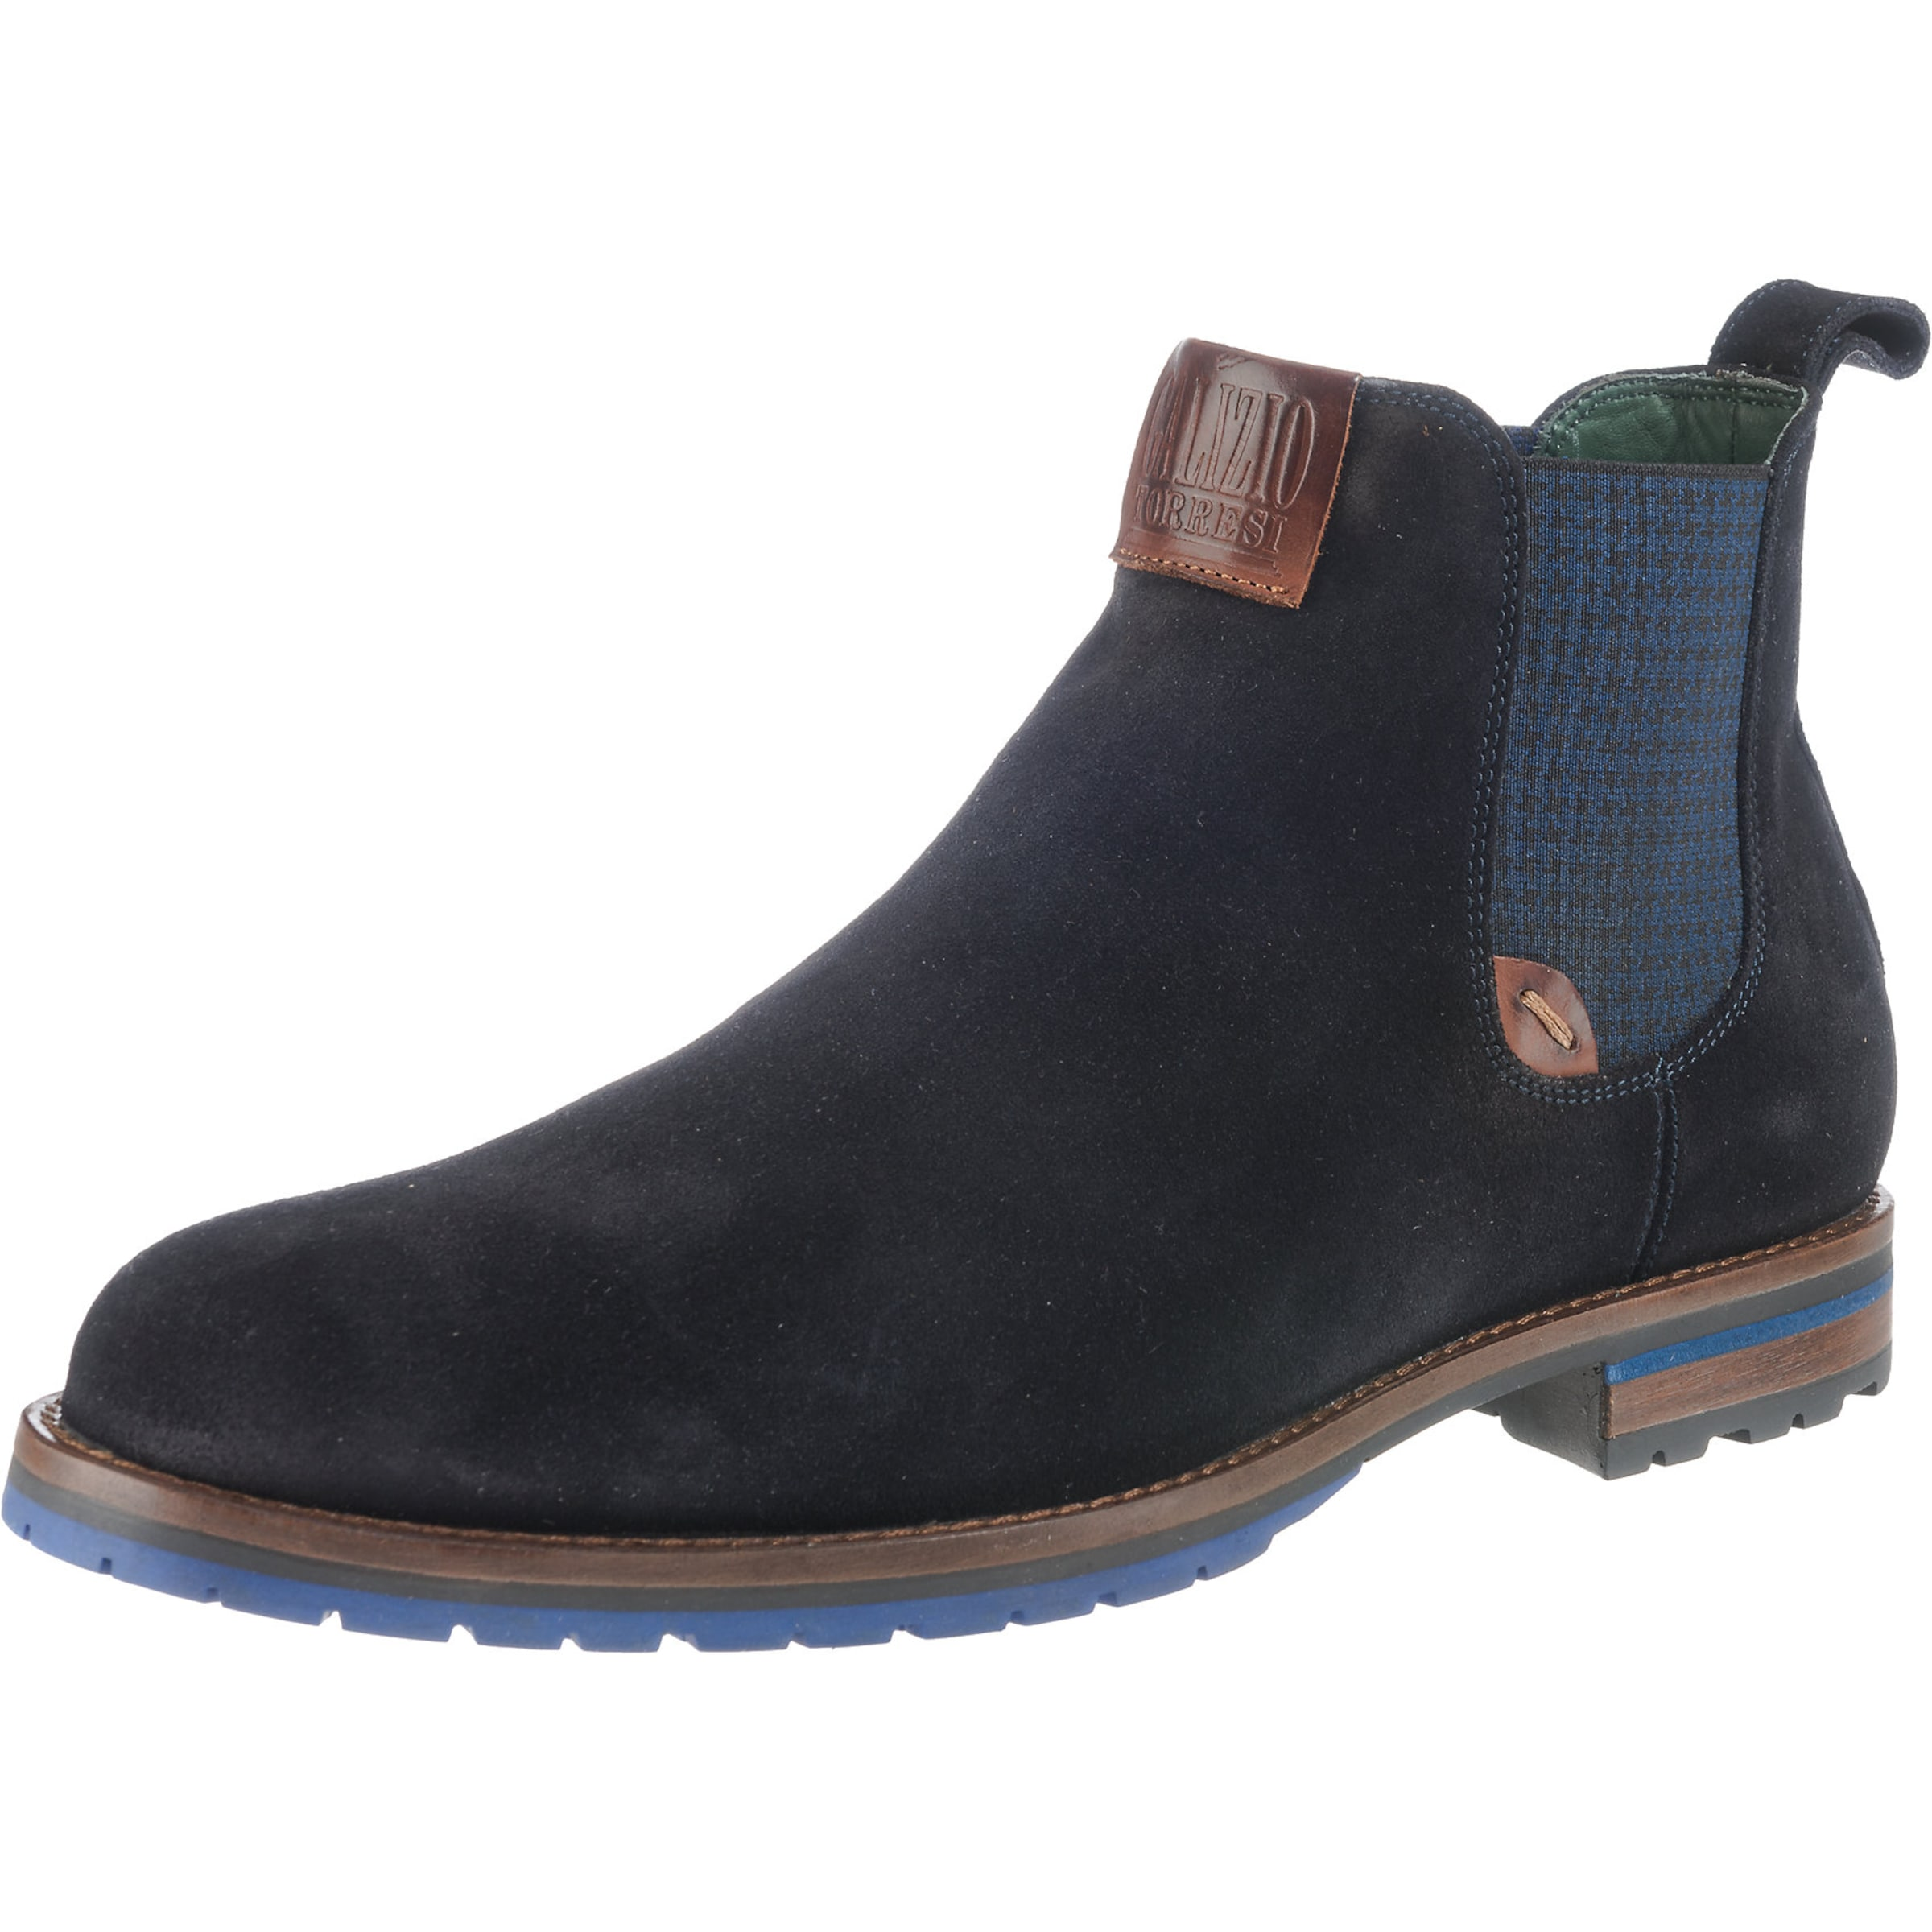 Torresi Boots Chelsea Galizio In NachtblauBraun thQBsdCorx